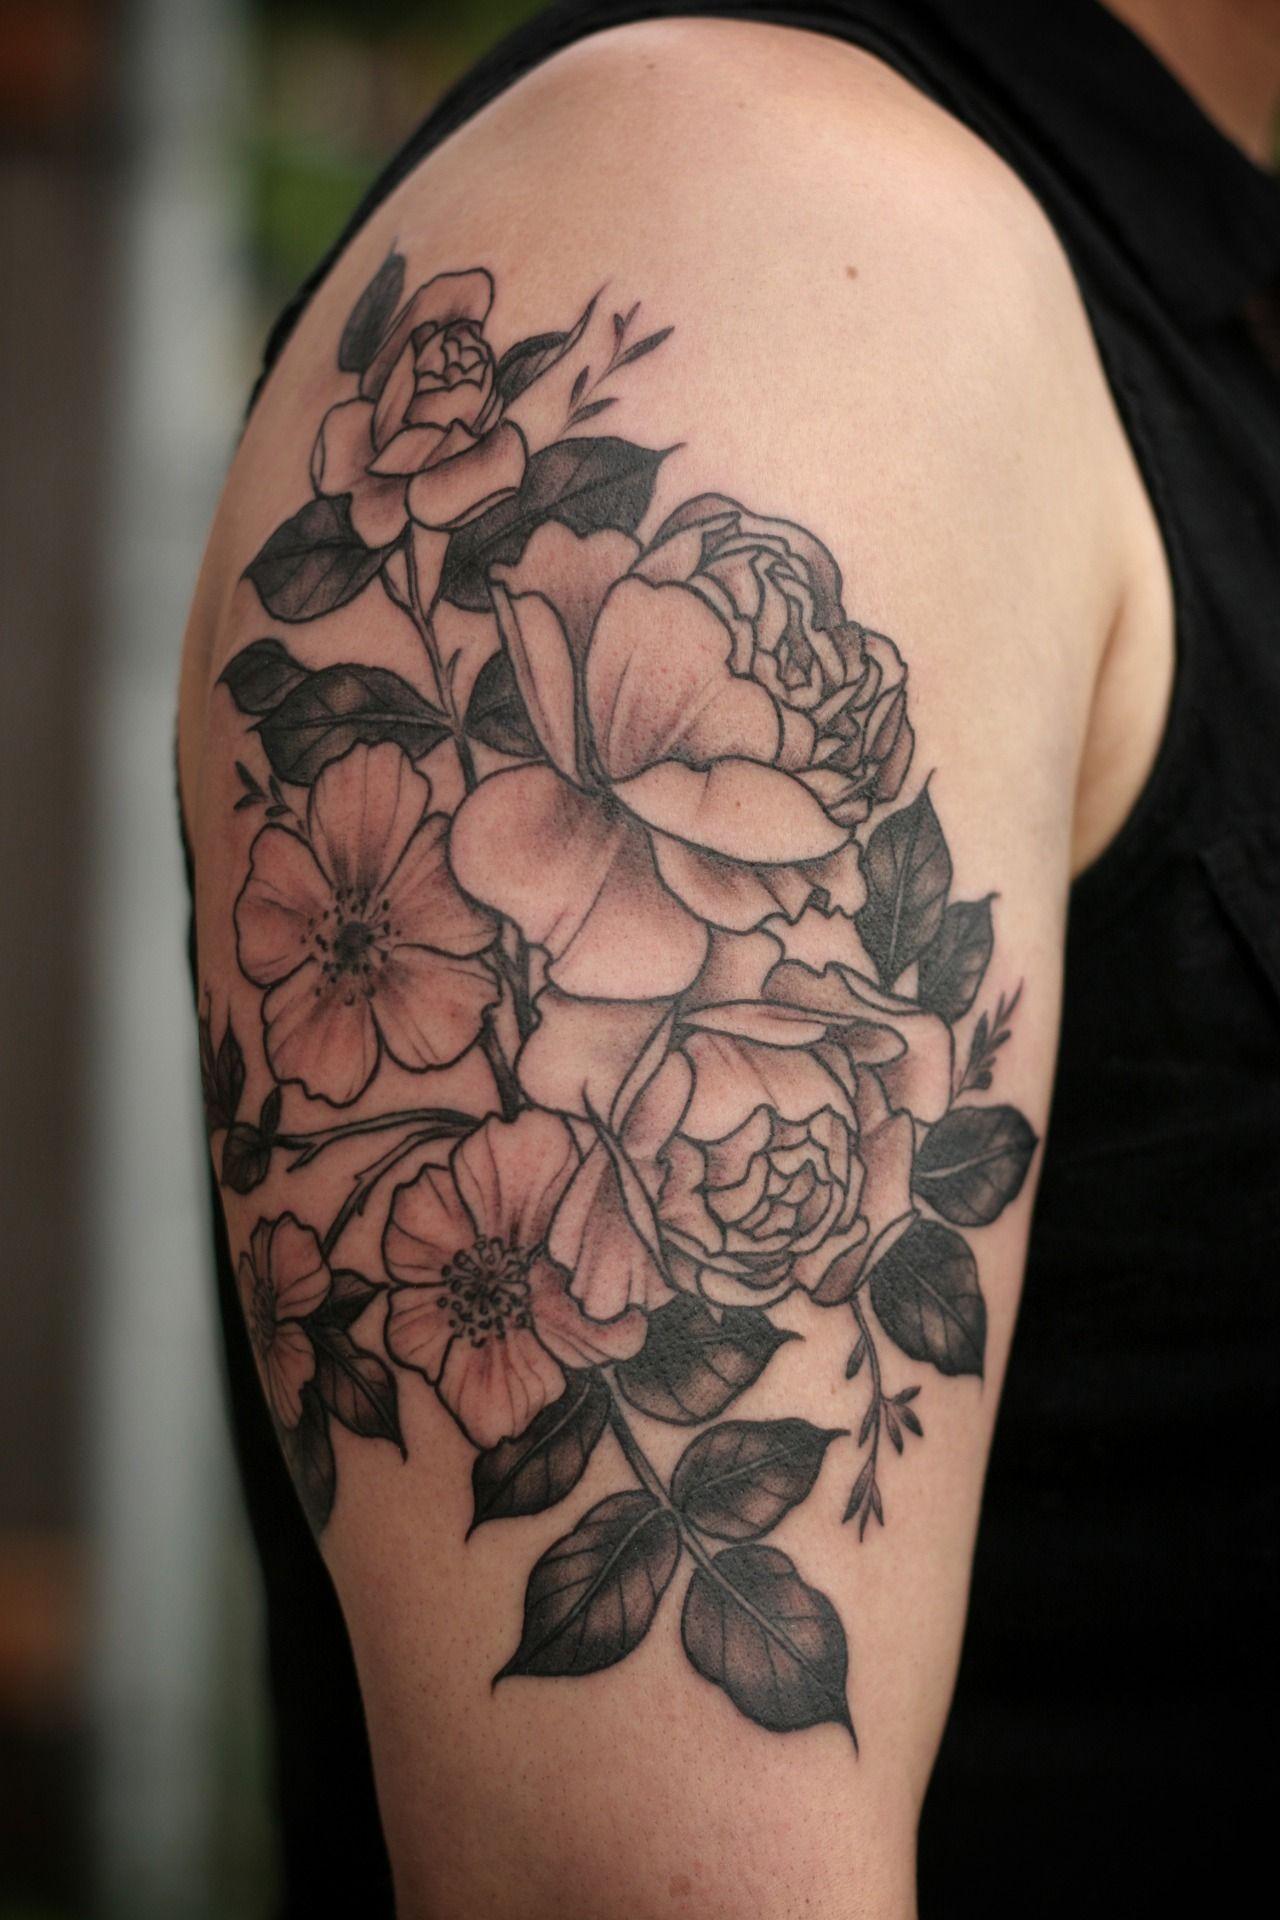 Alice carrier tatuagens pinterest wonderland tattoo and tattoo